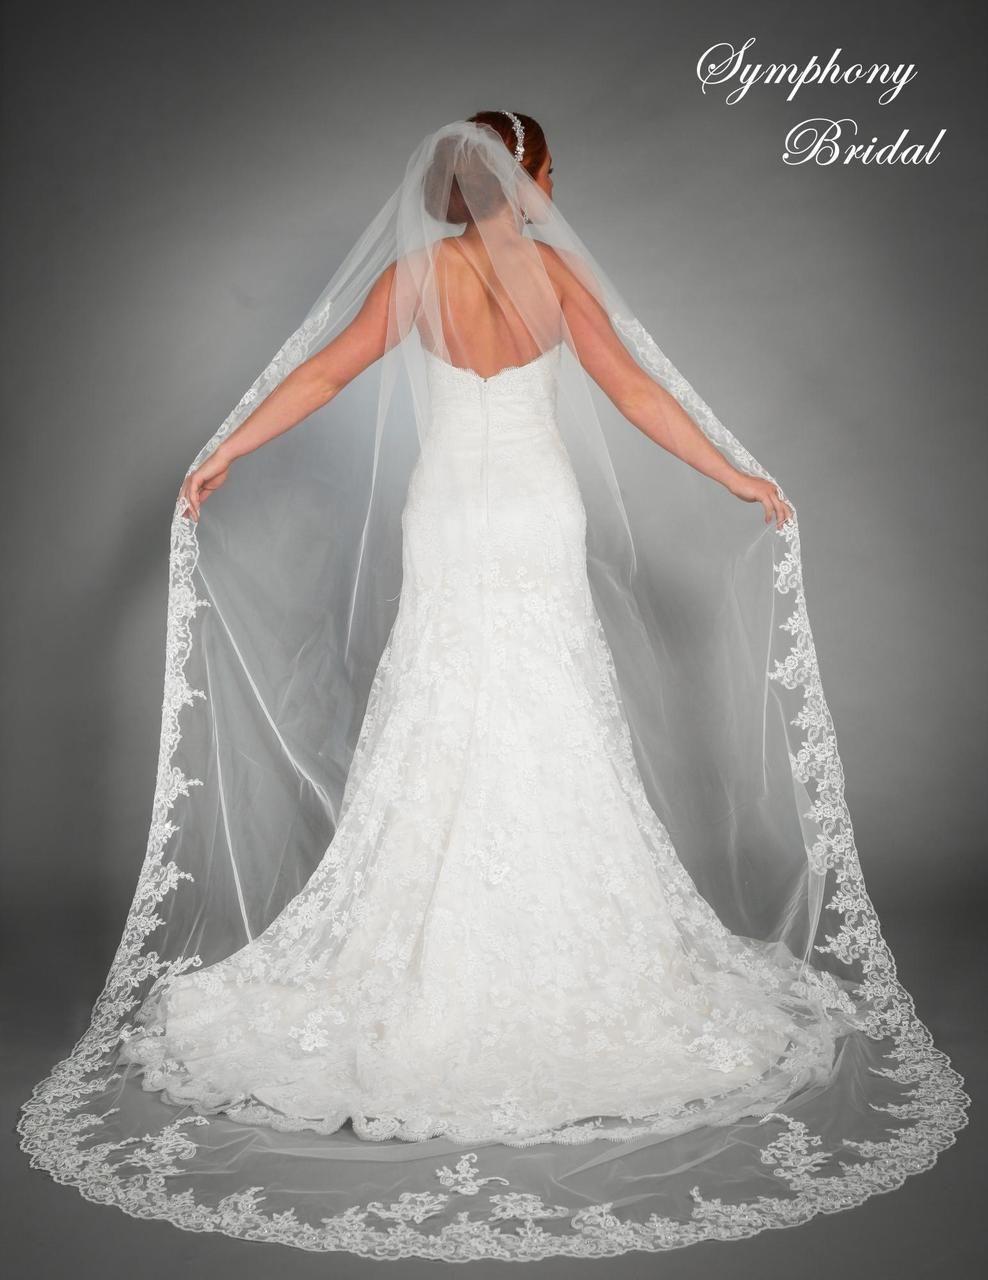 Lace Cathedral Length Wedding Veil 6442vl By Symphony Bridal Long Veils Bridal Tulle Bridal Veil Long Veil Wedding [ 1280 x 988 Pixel ]